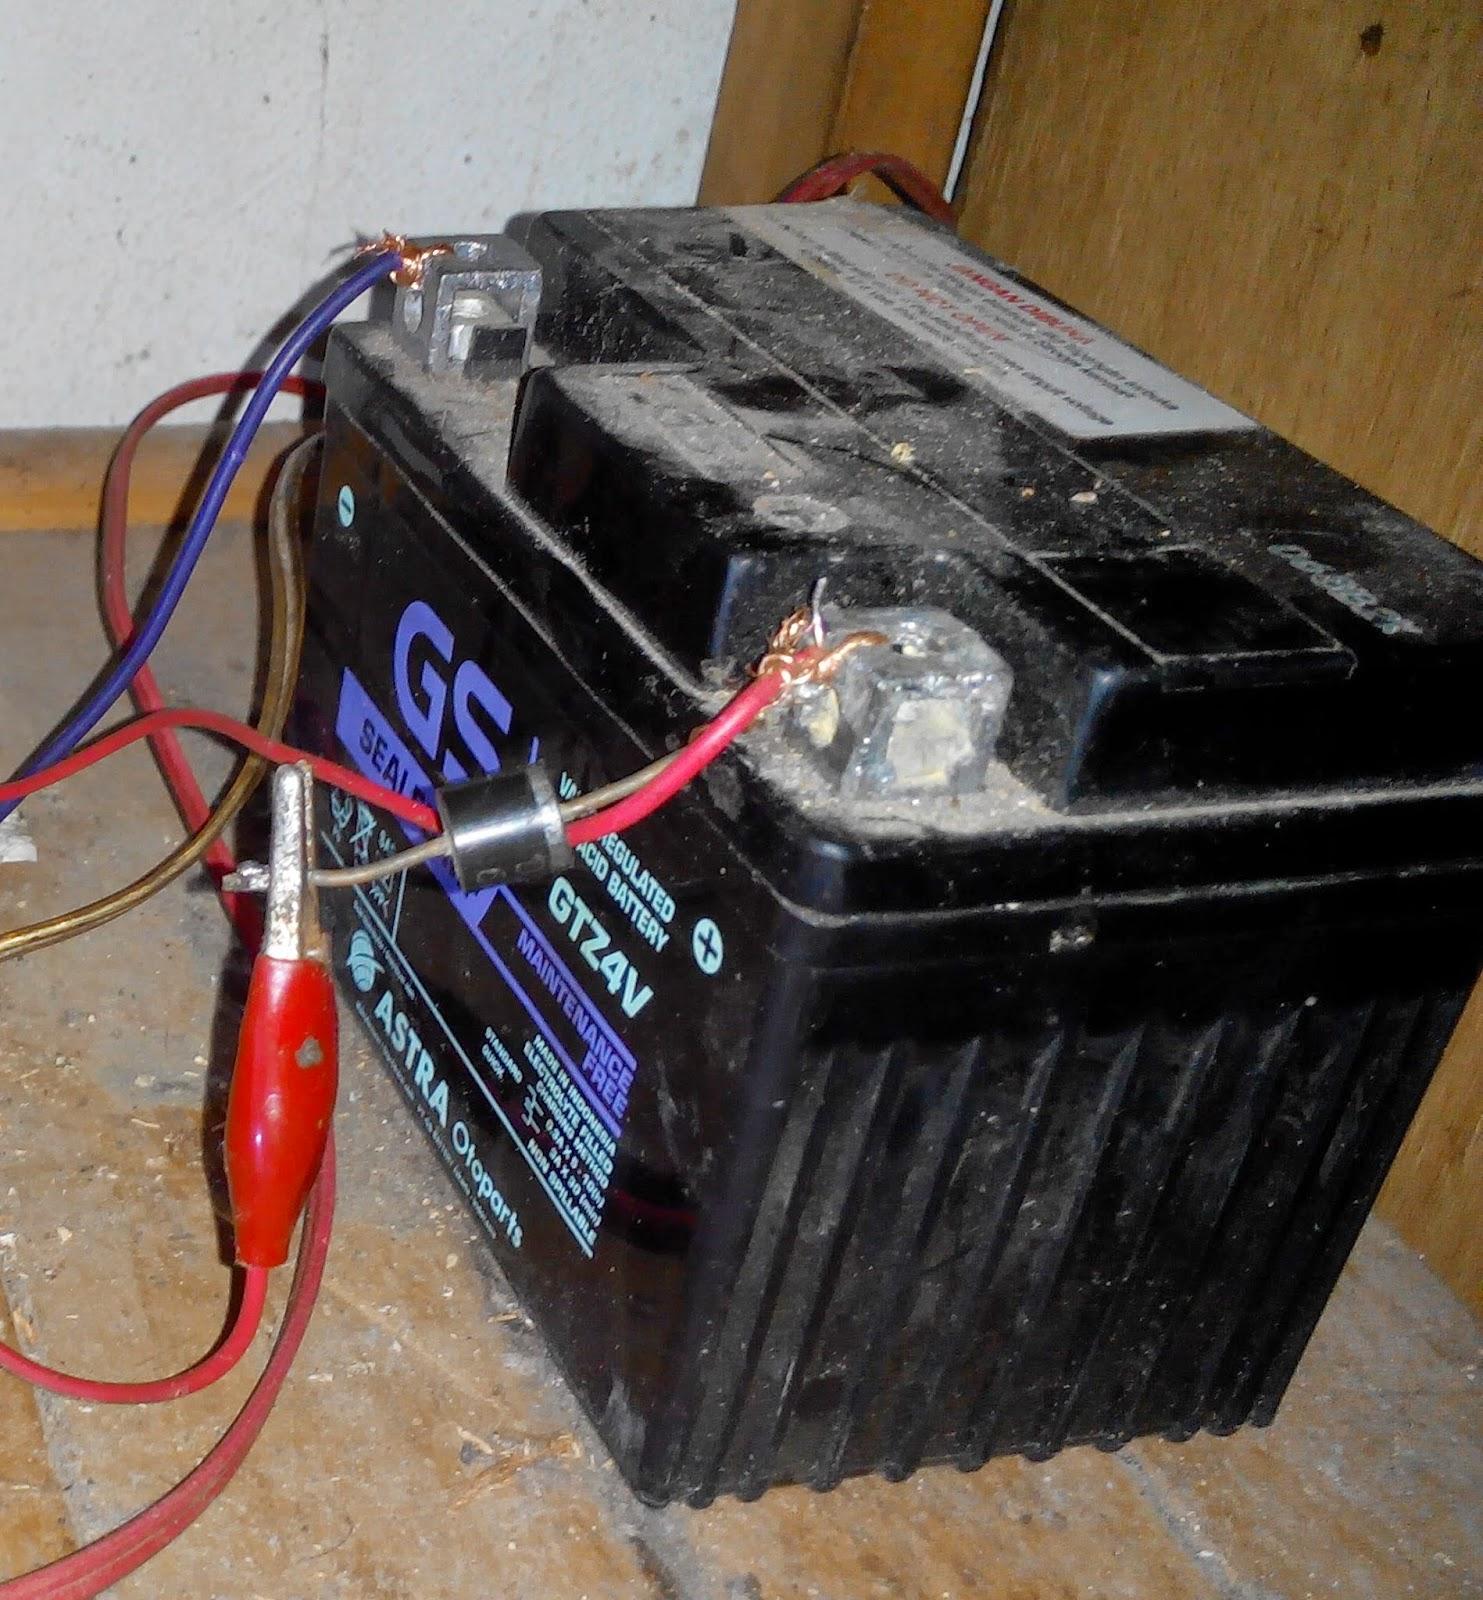 Ilmu Komputer Psu Bekas Pc Dijadikan Power Supply Car Audio Kabel Kebetulan Ada Aki Motor Honda Beat Nganggur Pasang Langsung Ke Hitam Dari Kutub Negatif